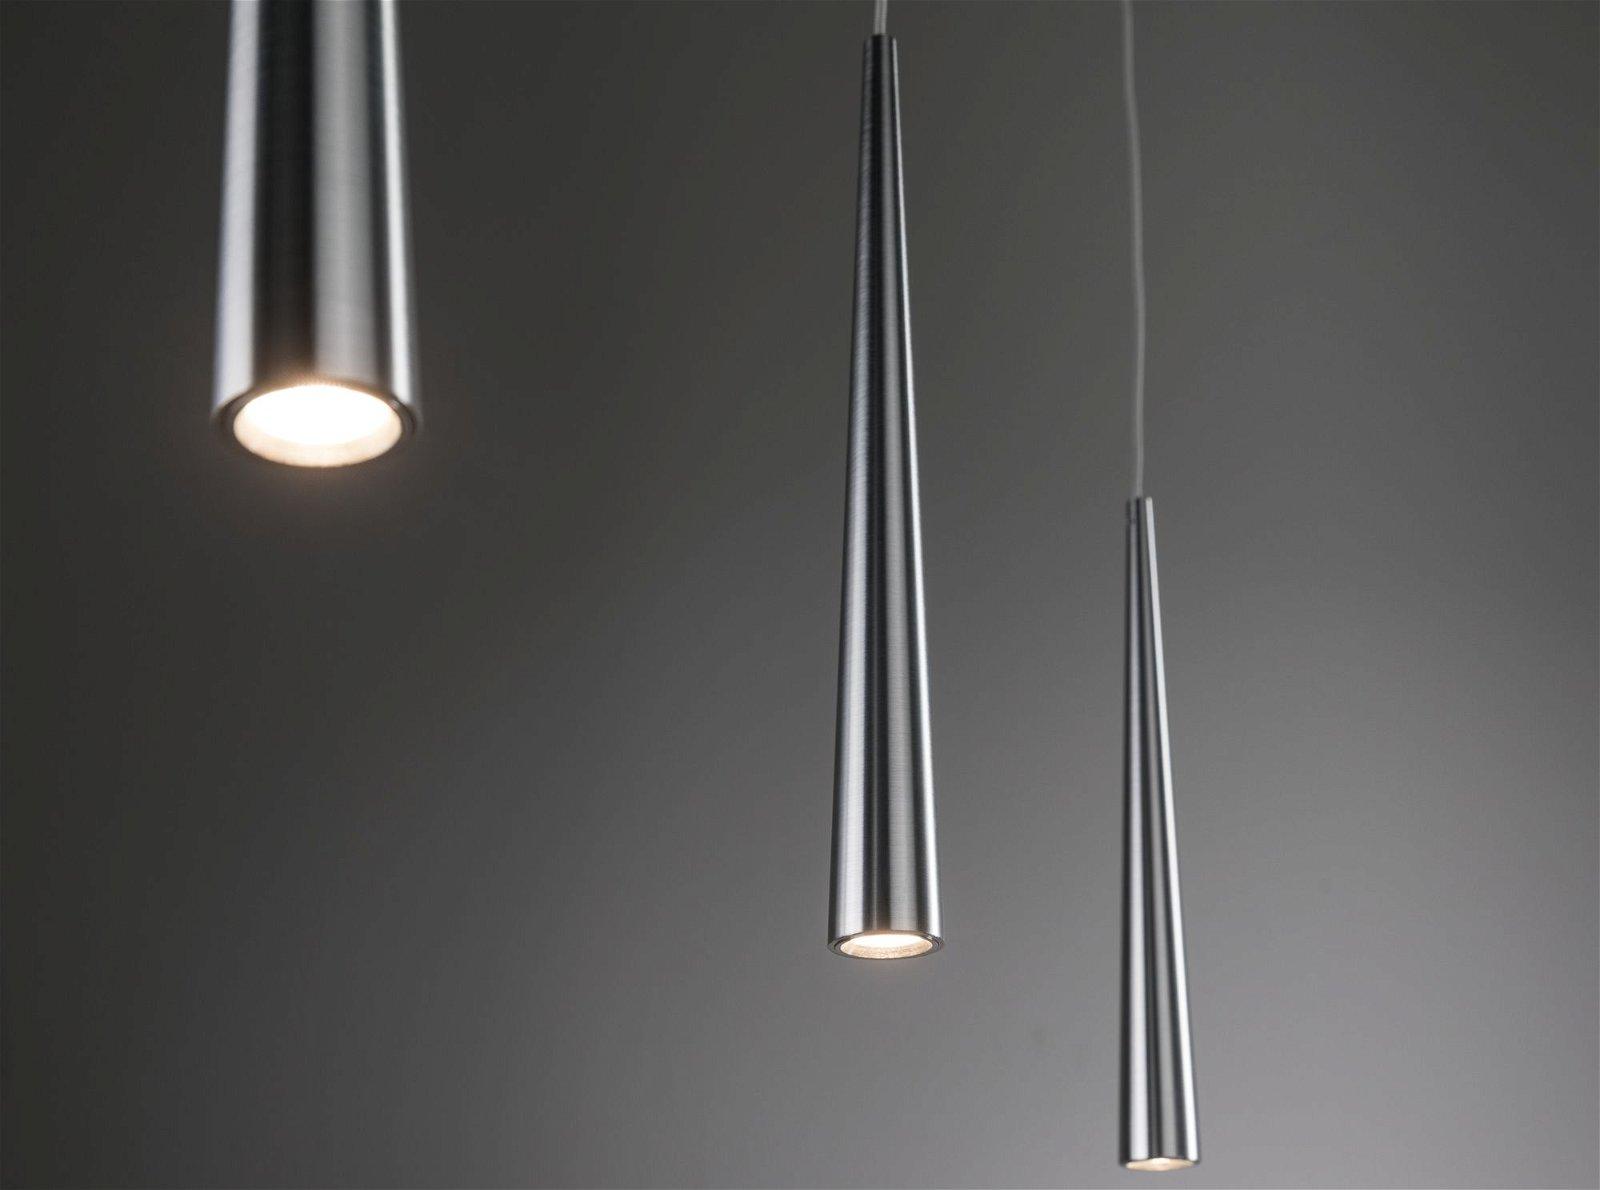 LED Pendelleuchte Gutta 2700K 3x600lm 3x7W Alu gebürstet